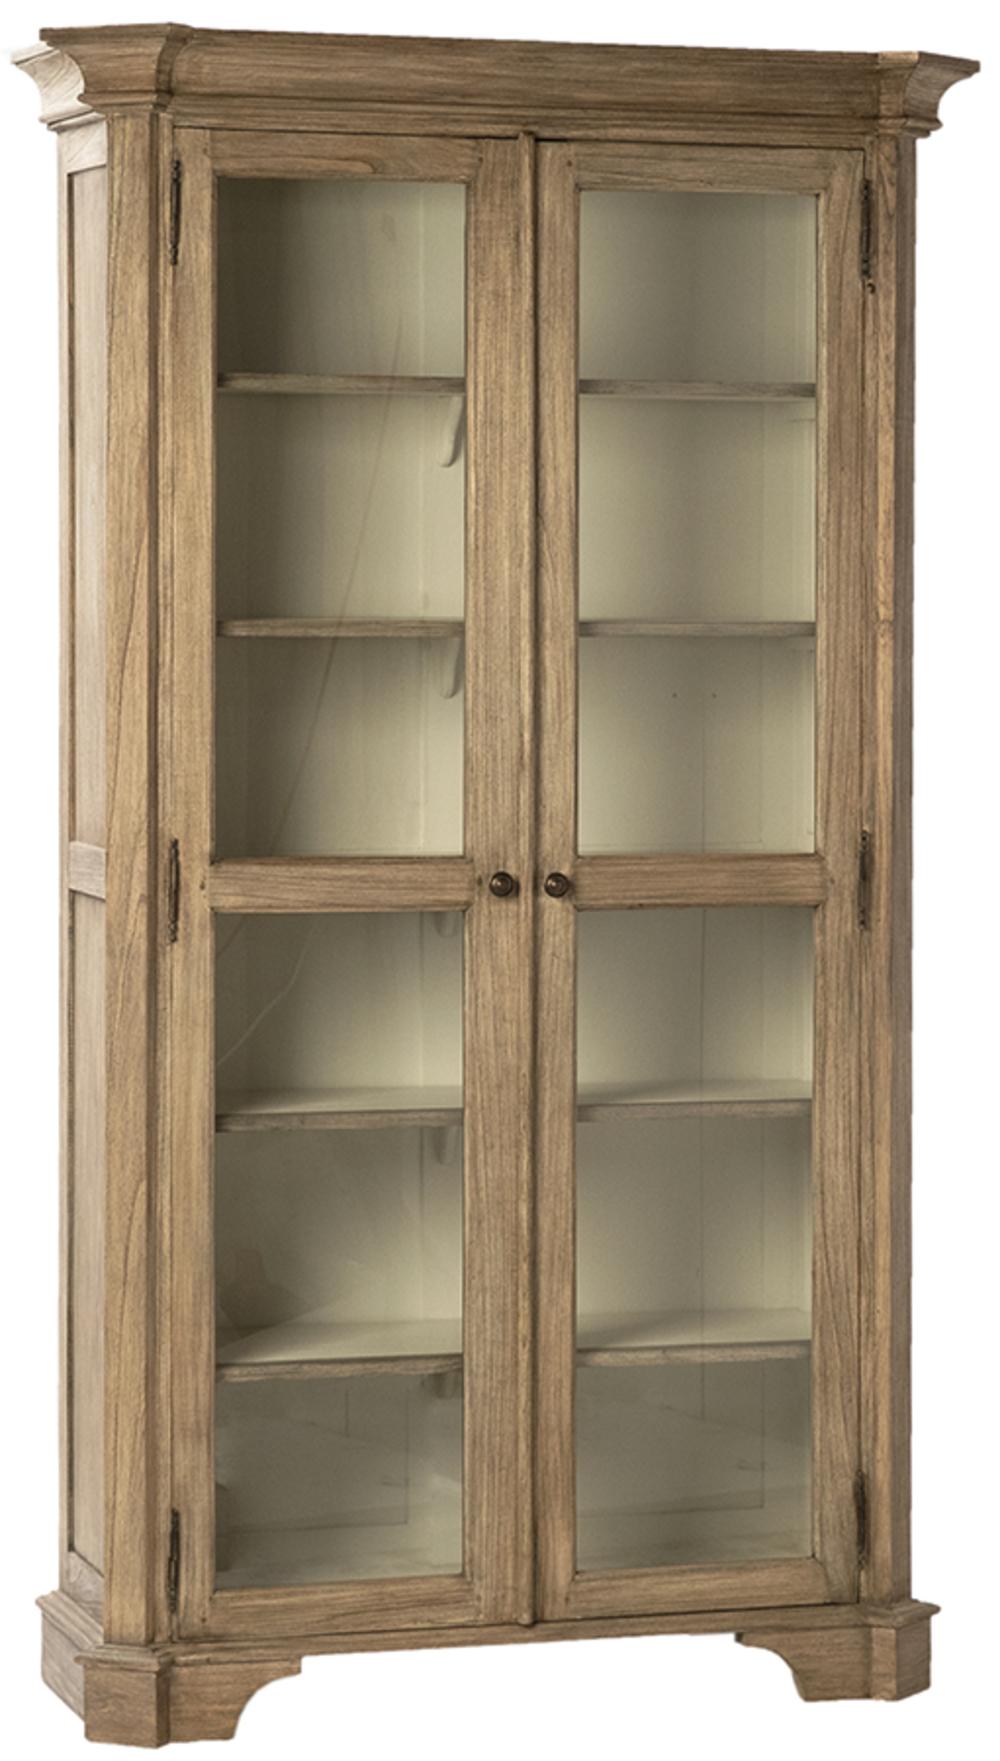 Dovetail Furniture - Zepar Bookcase